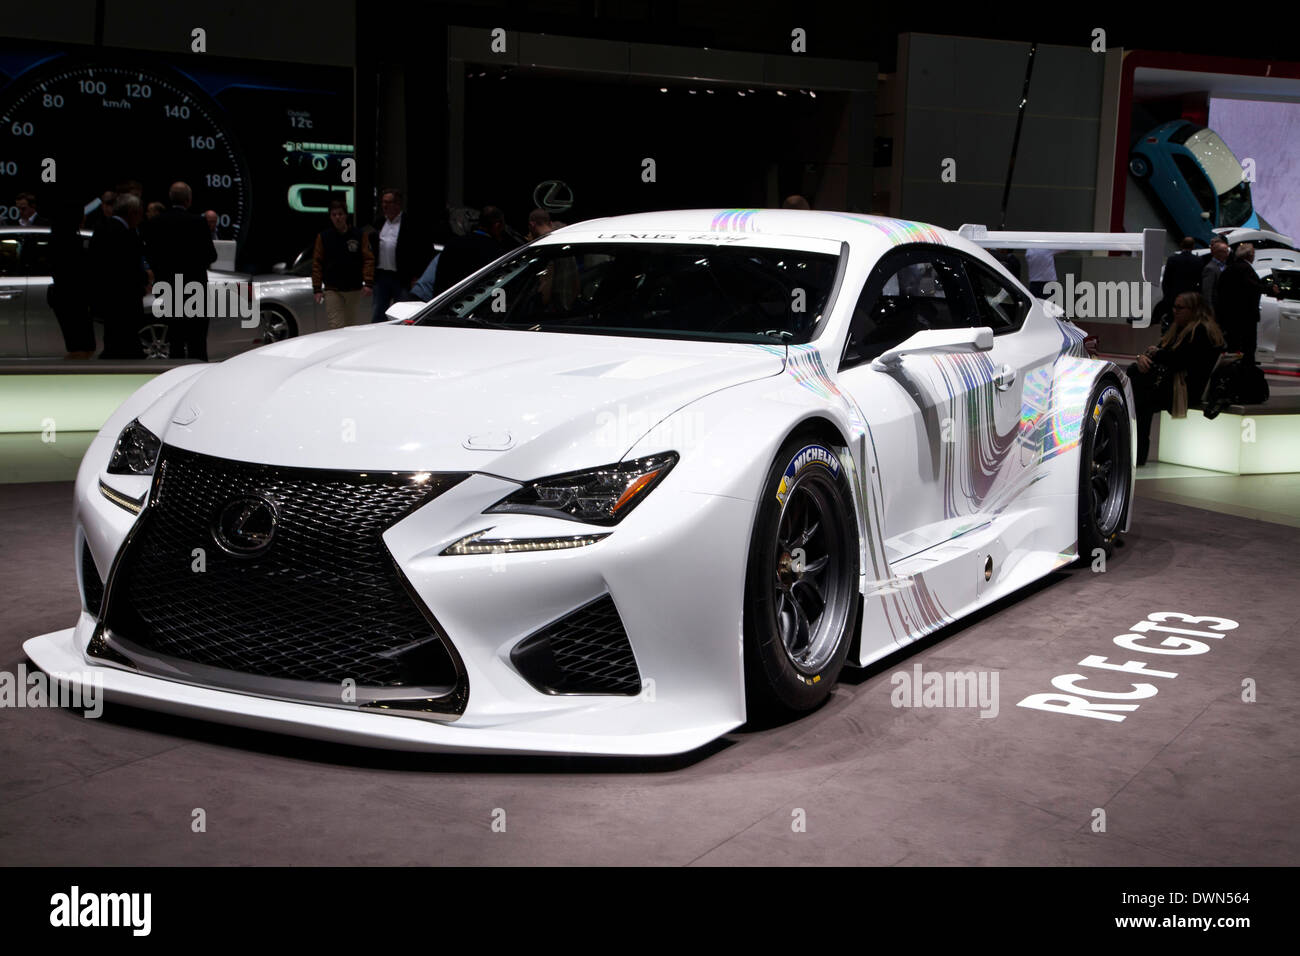 Lexus RC F GT3 Racing Concept at the 84th Geneva International Motor ...